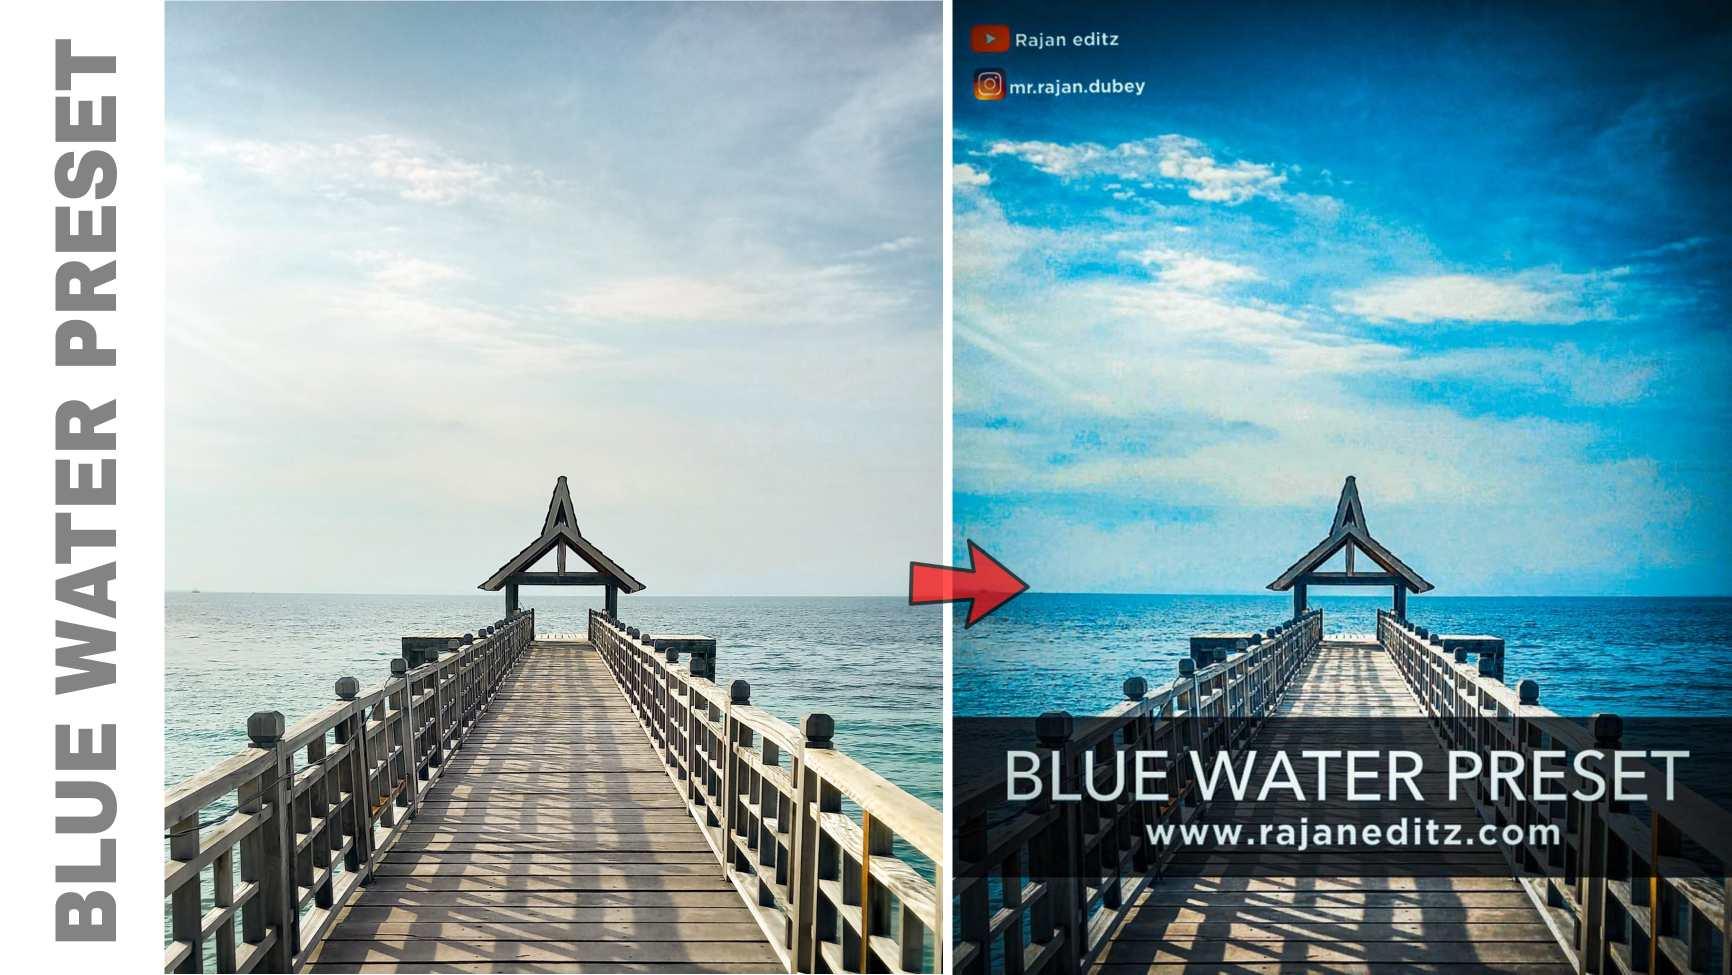 Blue Water Presets __ rajan editz